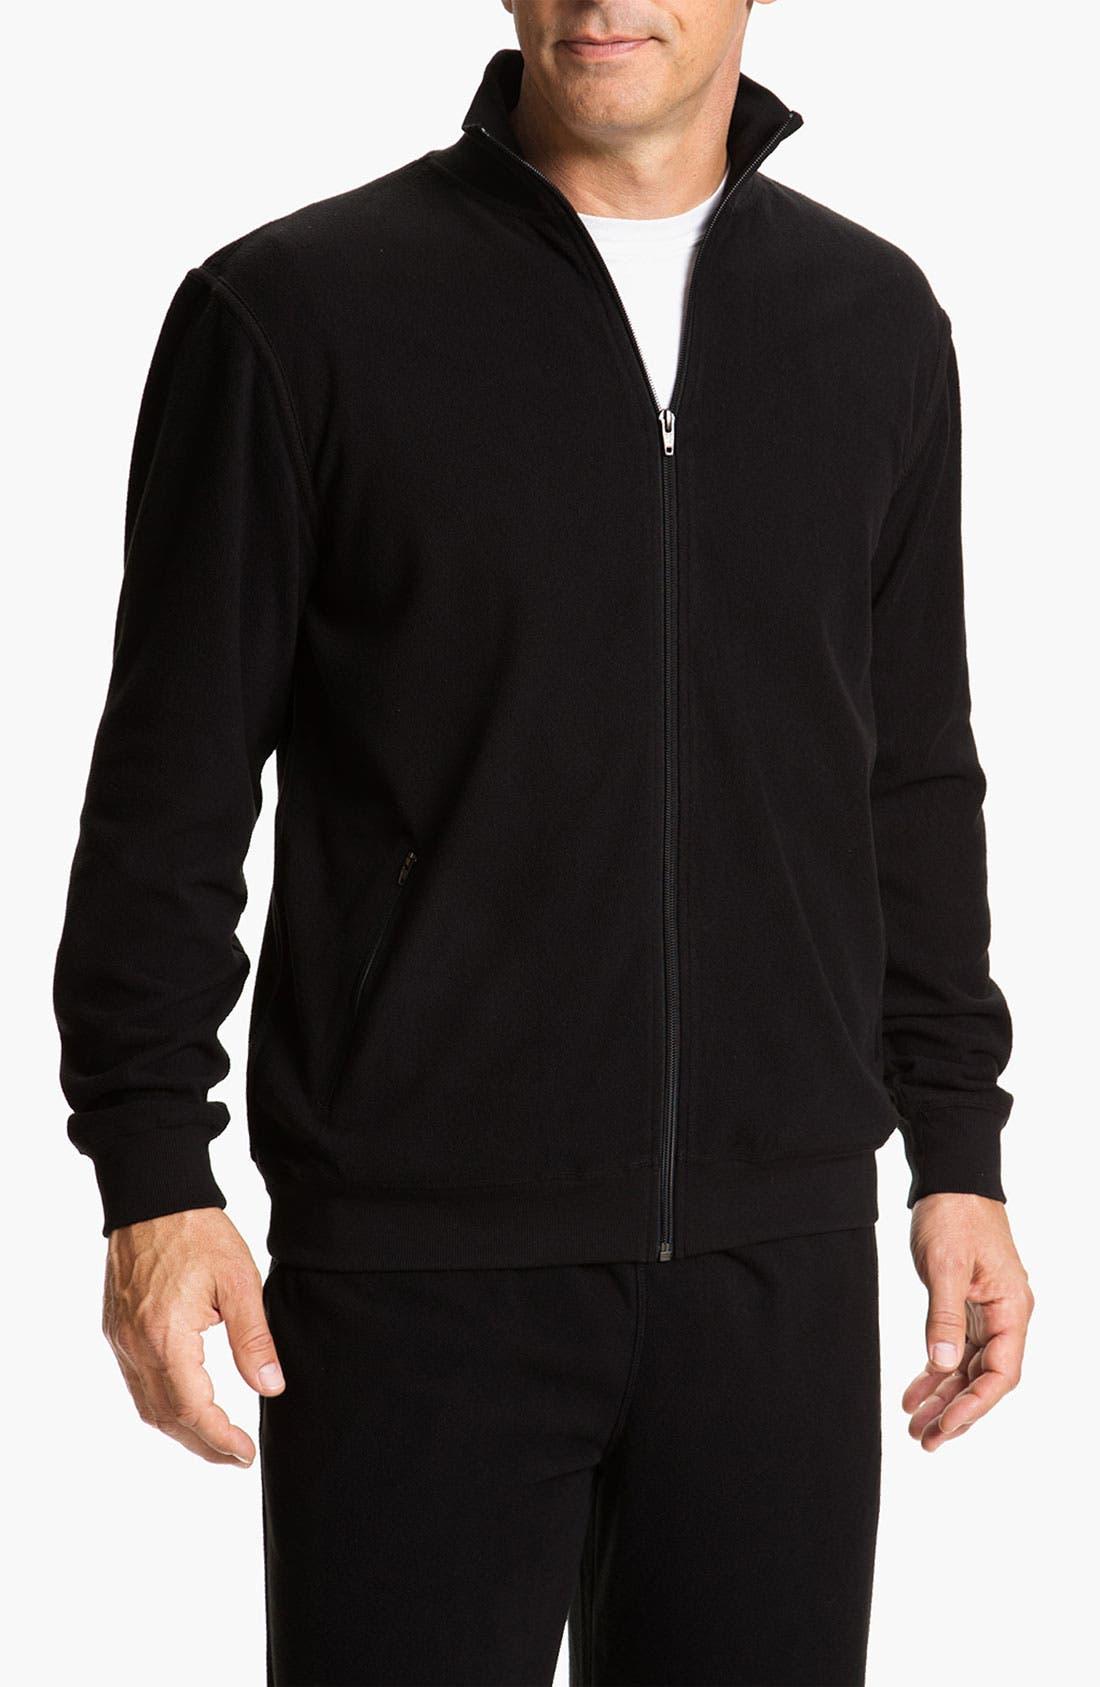 Main Image - Daniel Buchler Lightweight Fleece Track Jacket